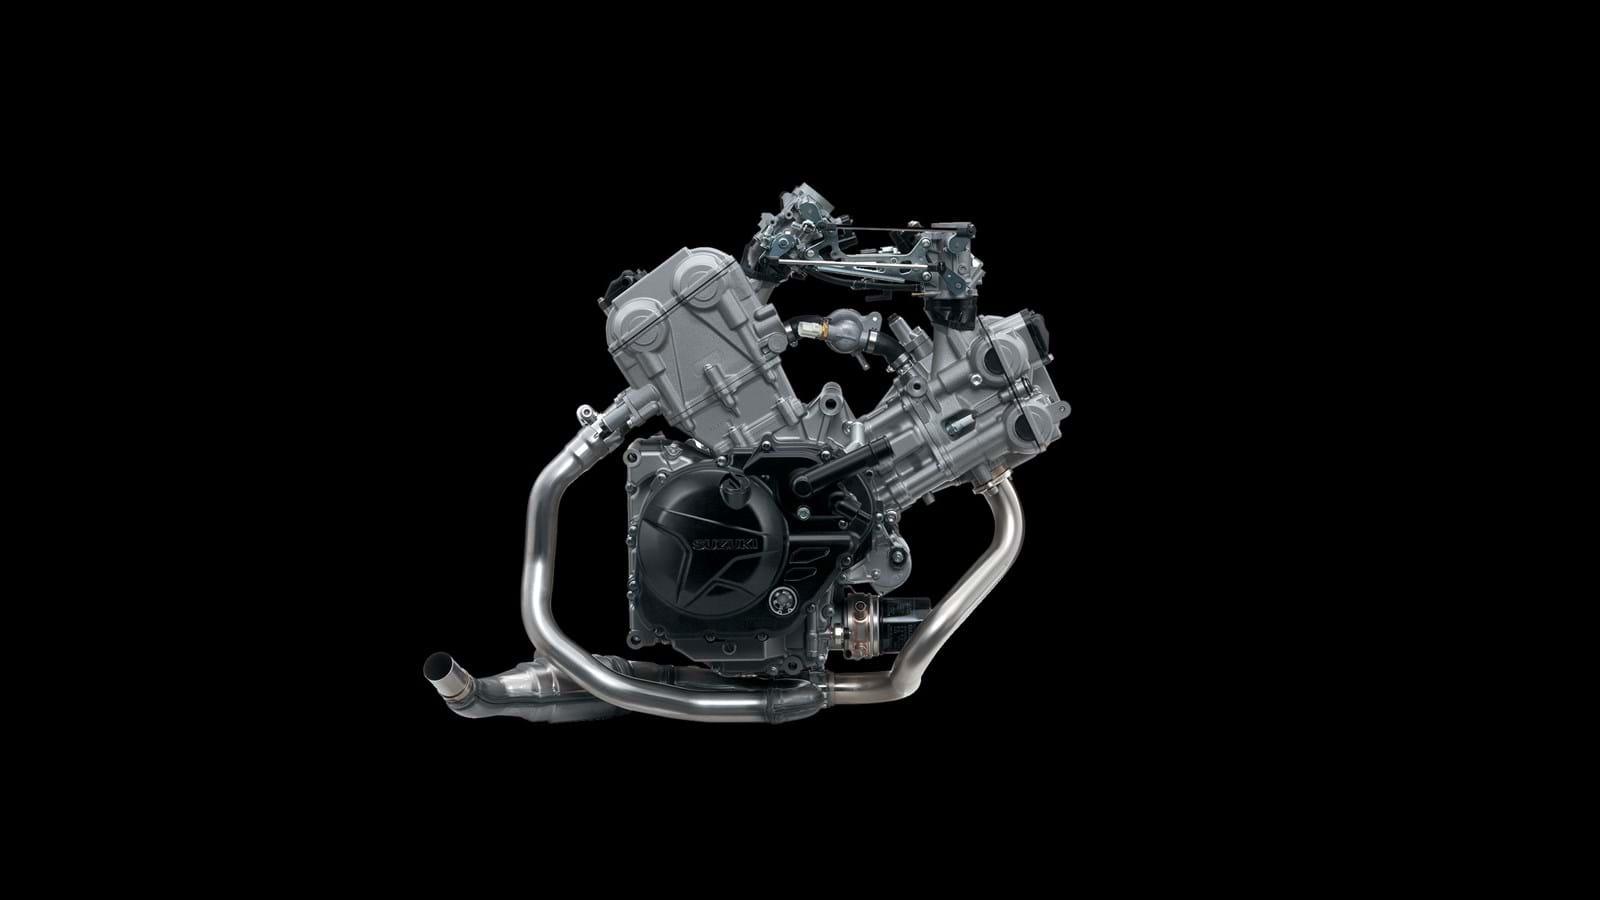 SV650 獨特 V-Twin 引擎傳遞出的鼓動感